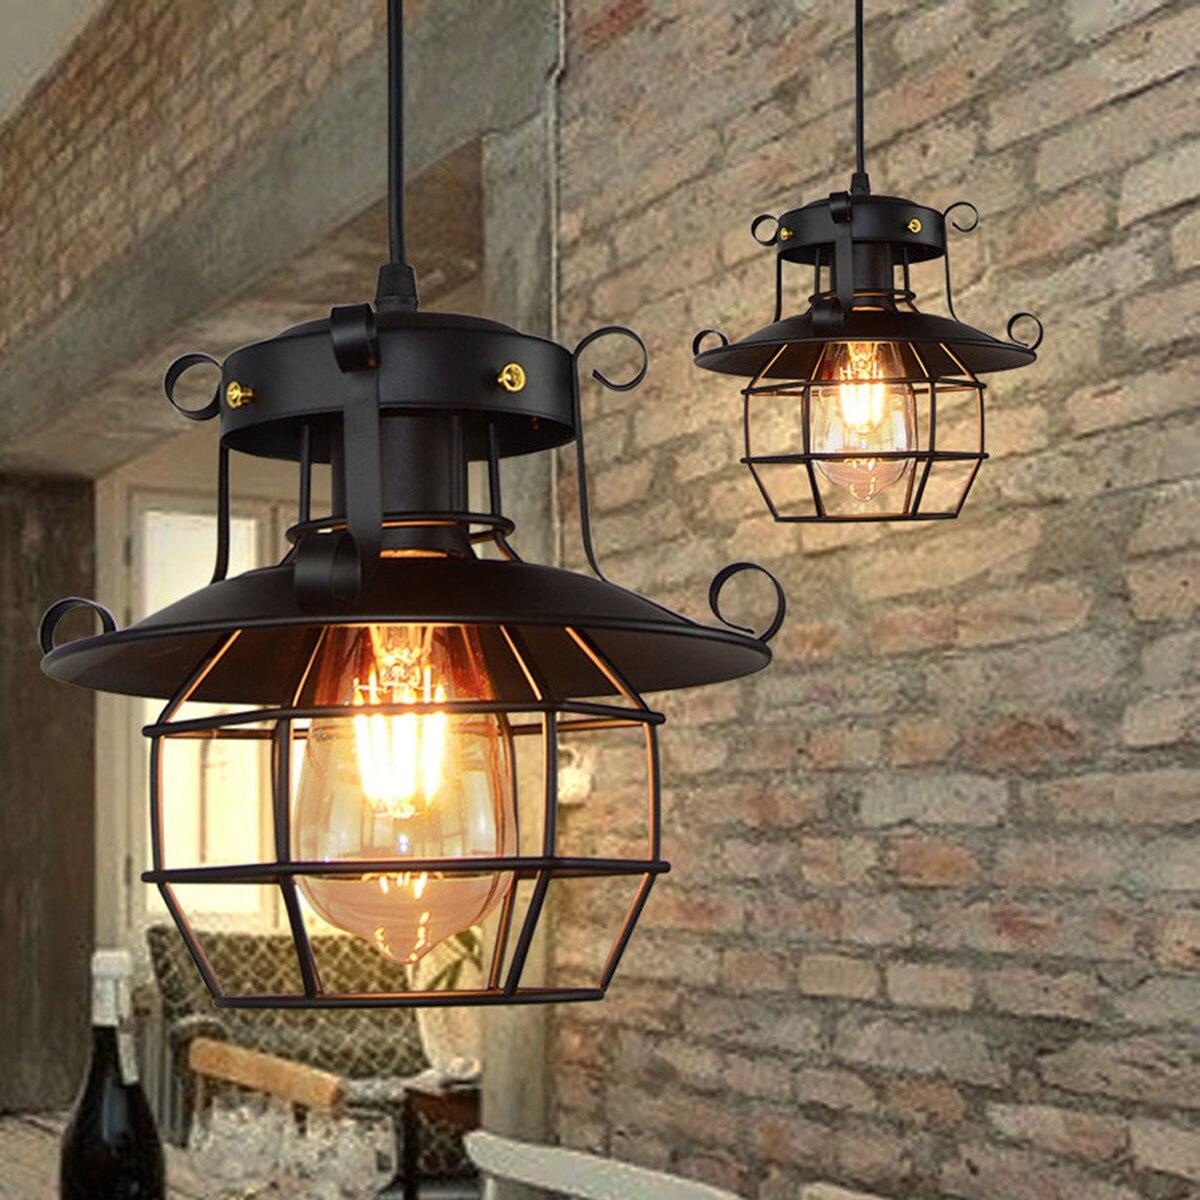 e27 barra de luz pingente cozinha retro industrial pendurado lampada luz teto luminarias lustre gaiola edison